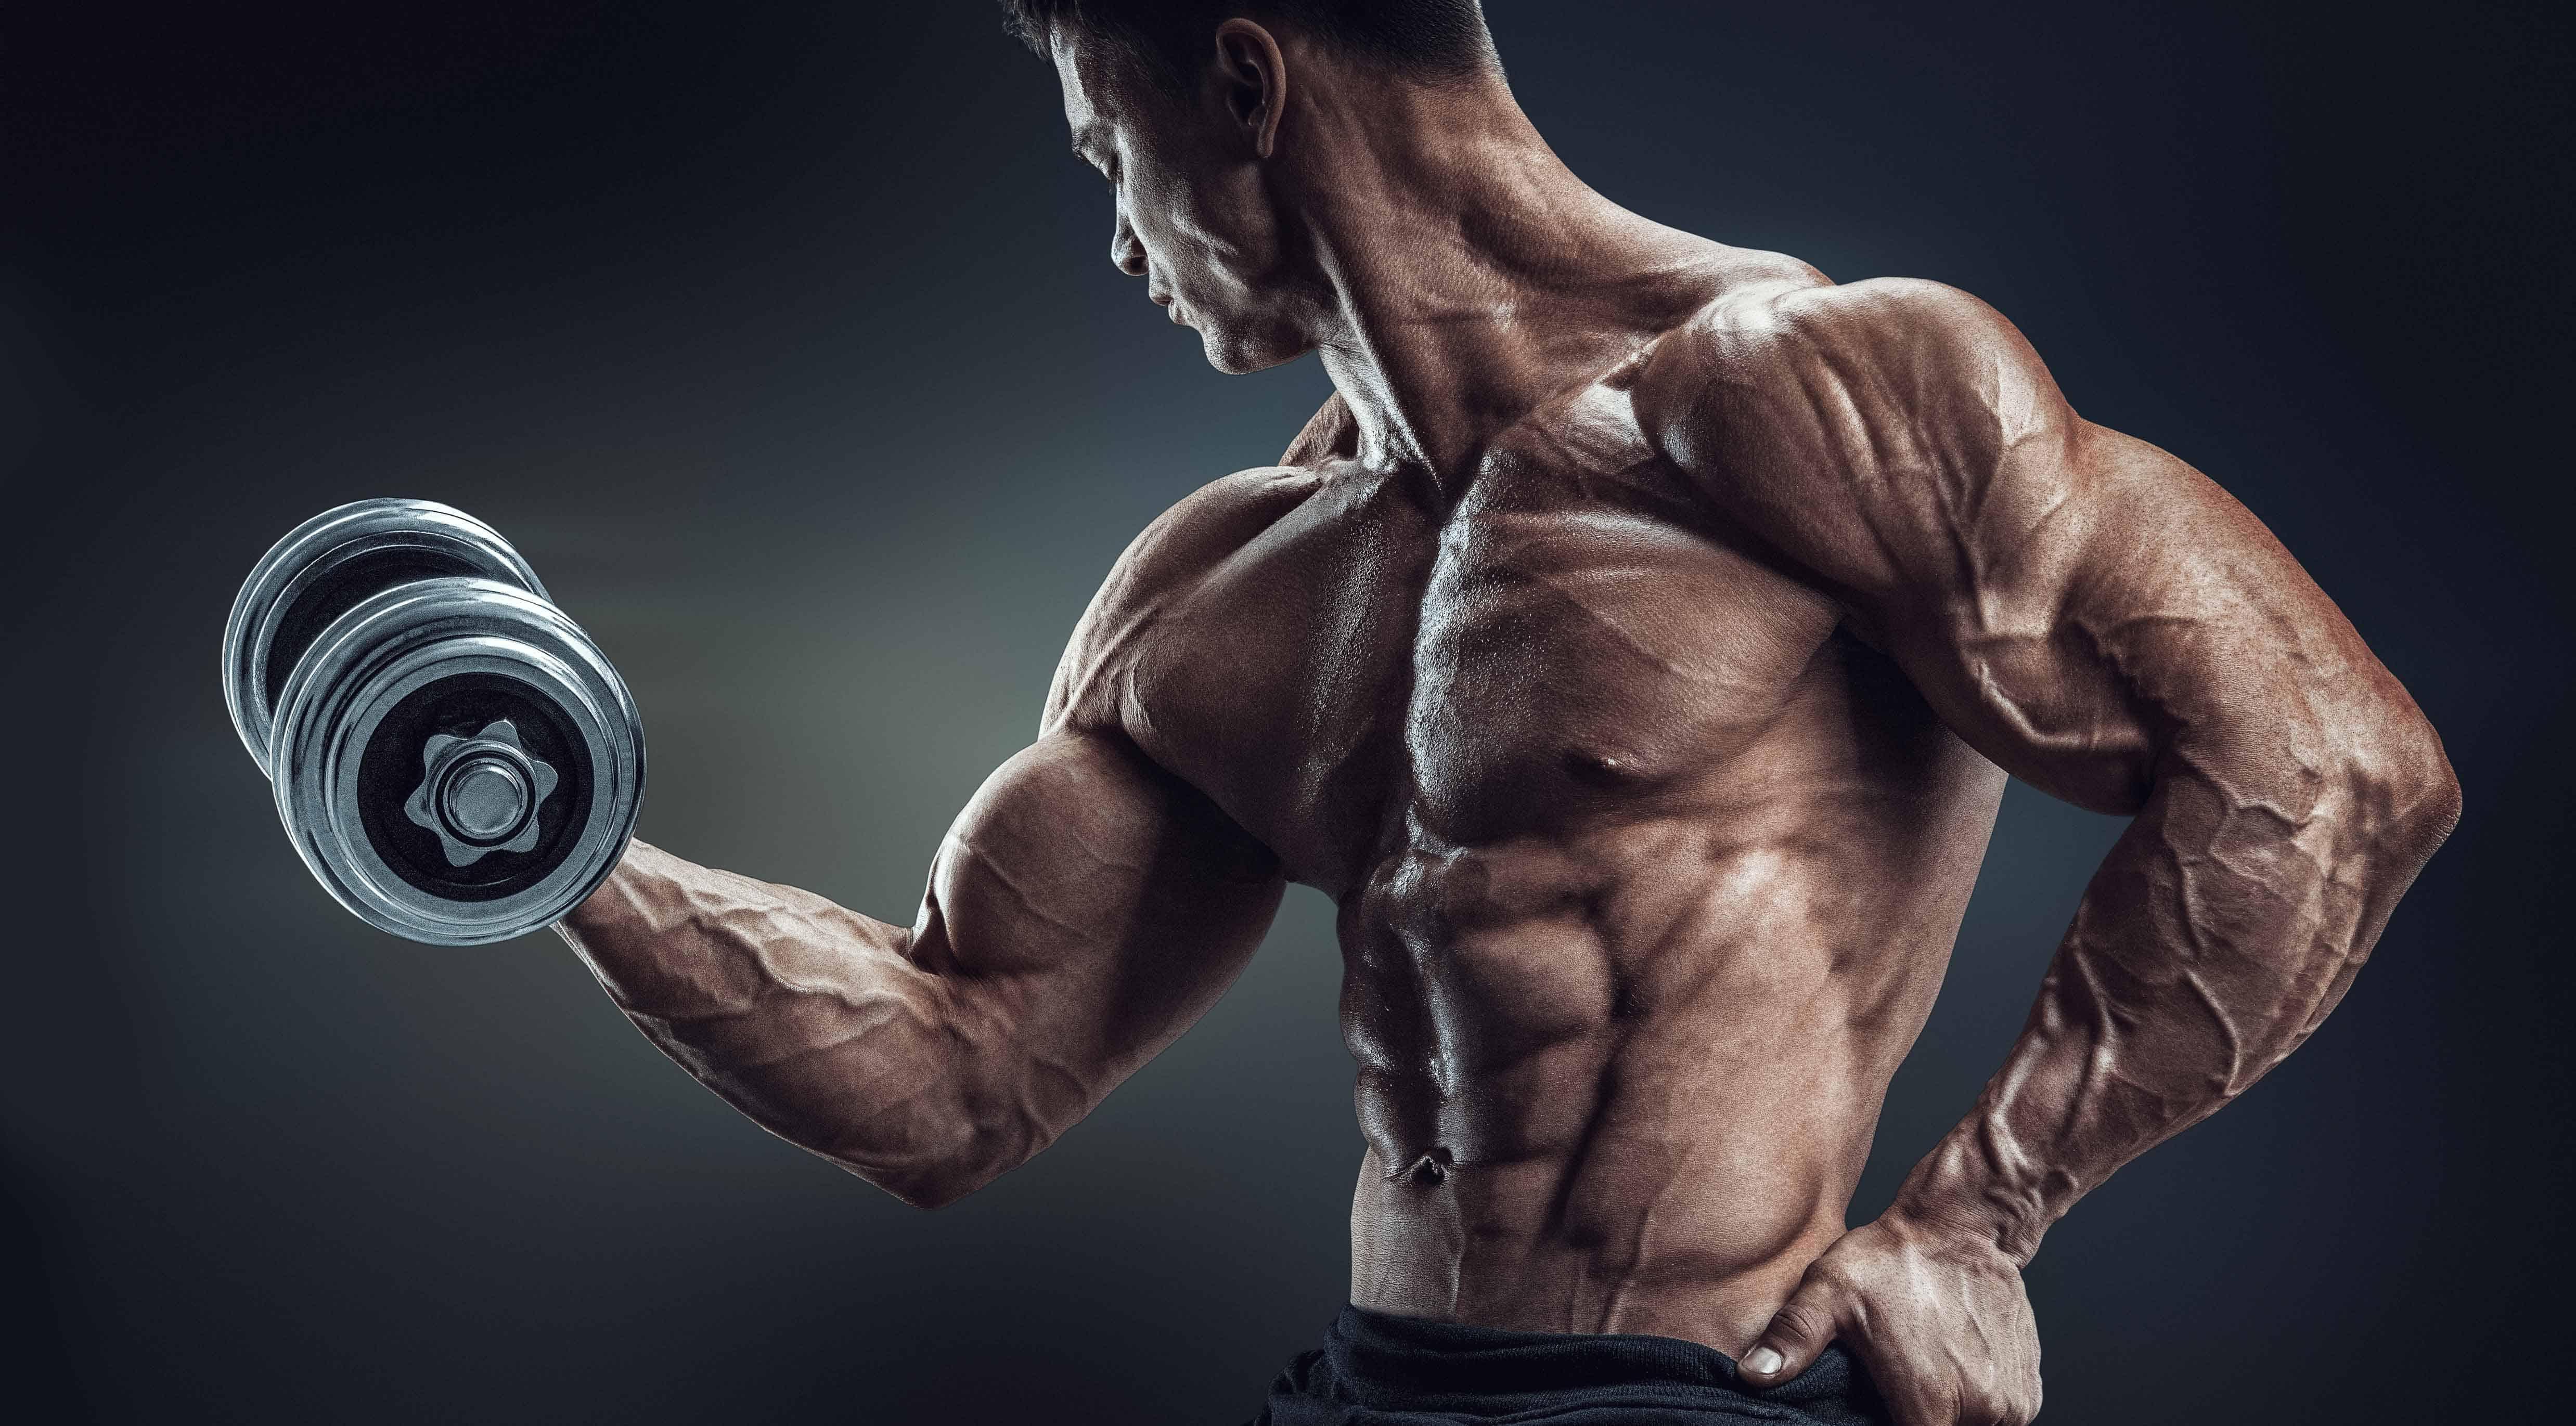 bicepsmancuernas